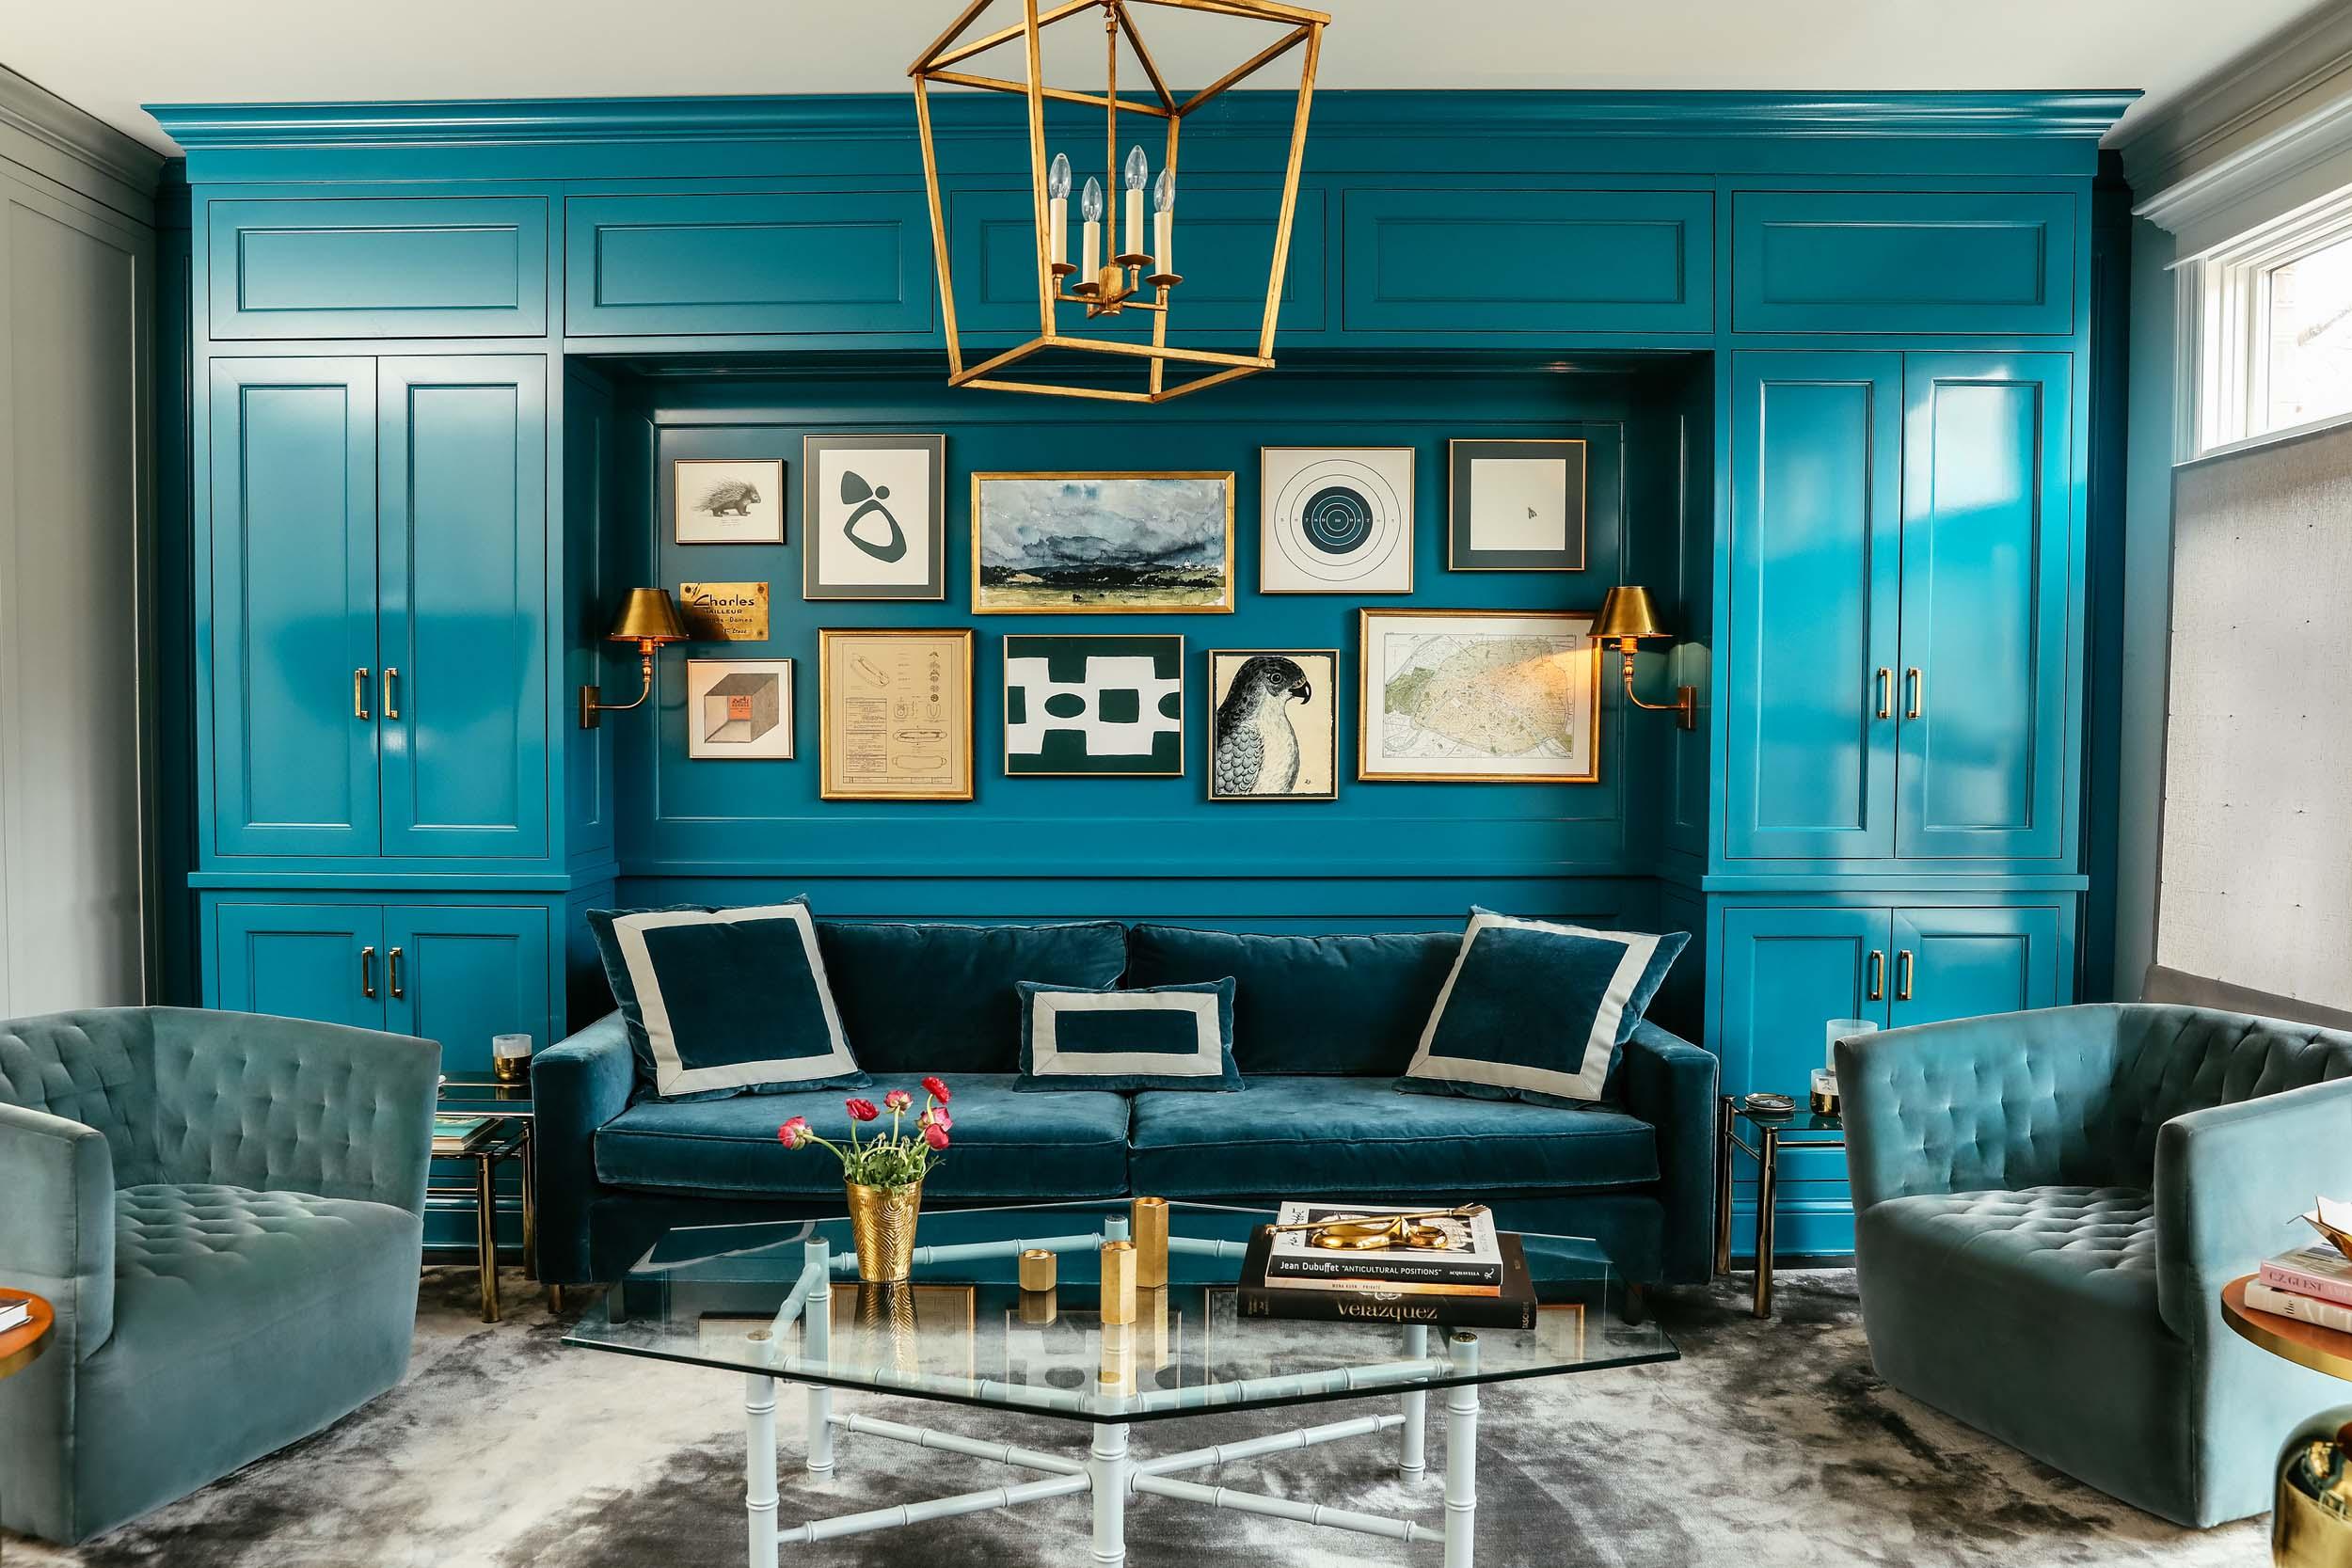 Leo_Designs_Chicago_interior_design_Chicago_A_Colorful_Renovation24.jpg